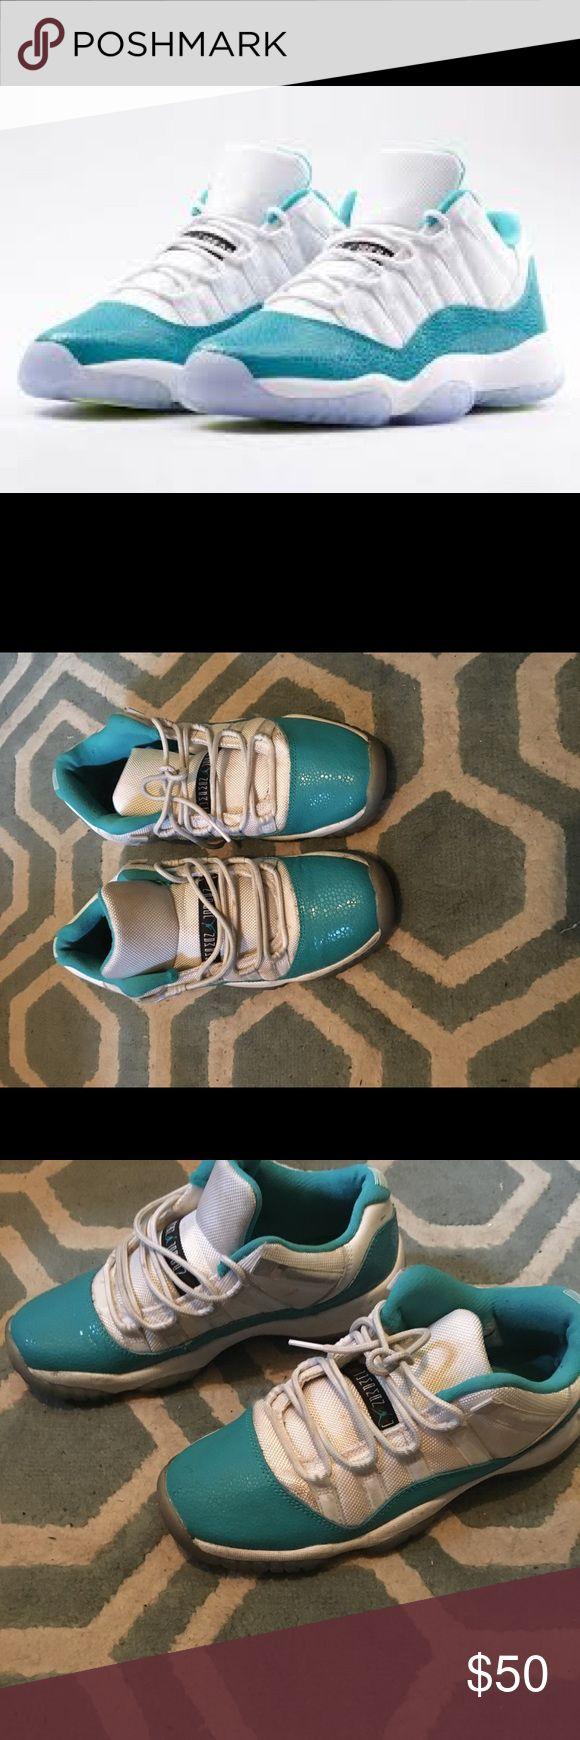 Air Jordan 11 snake print Low number 11s in teal snake print size 6 men size 8 women Air Jordan Shoes Sneakers